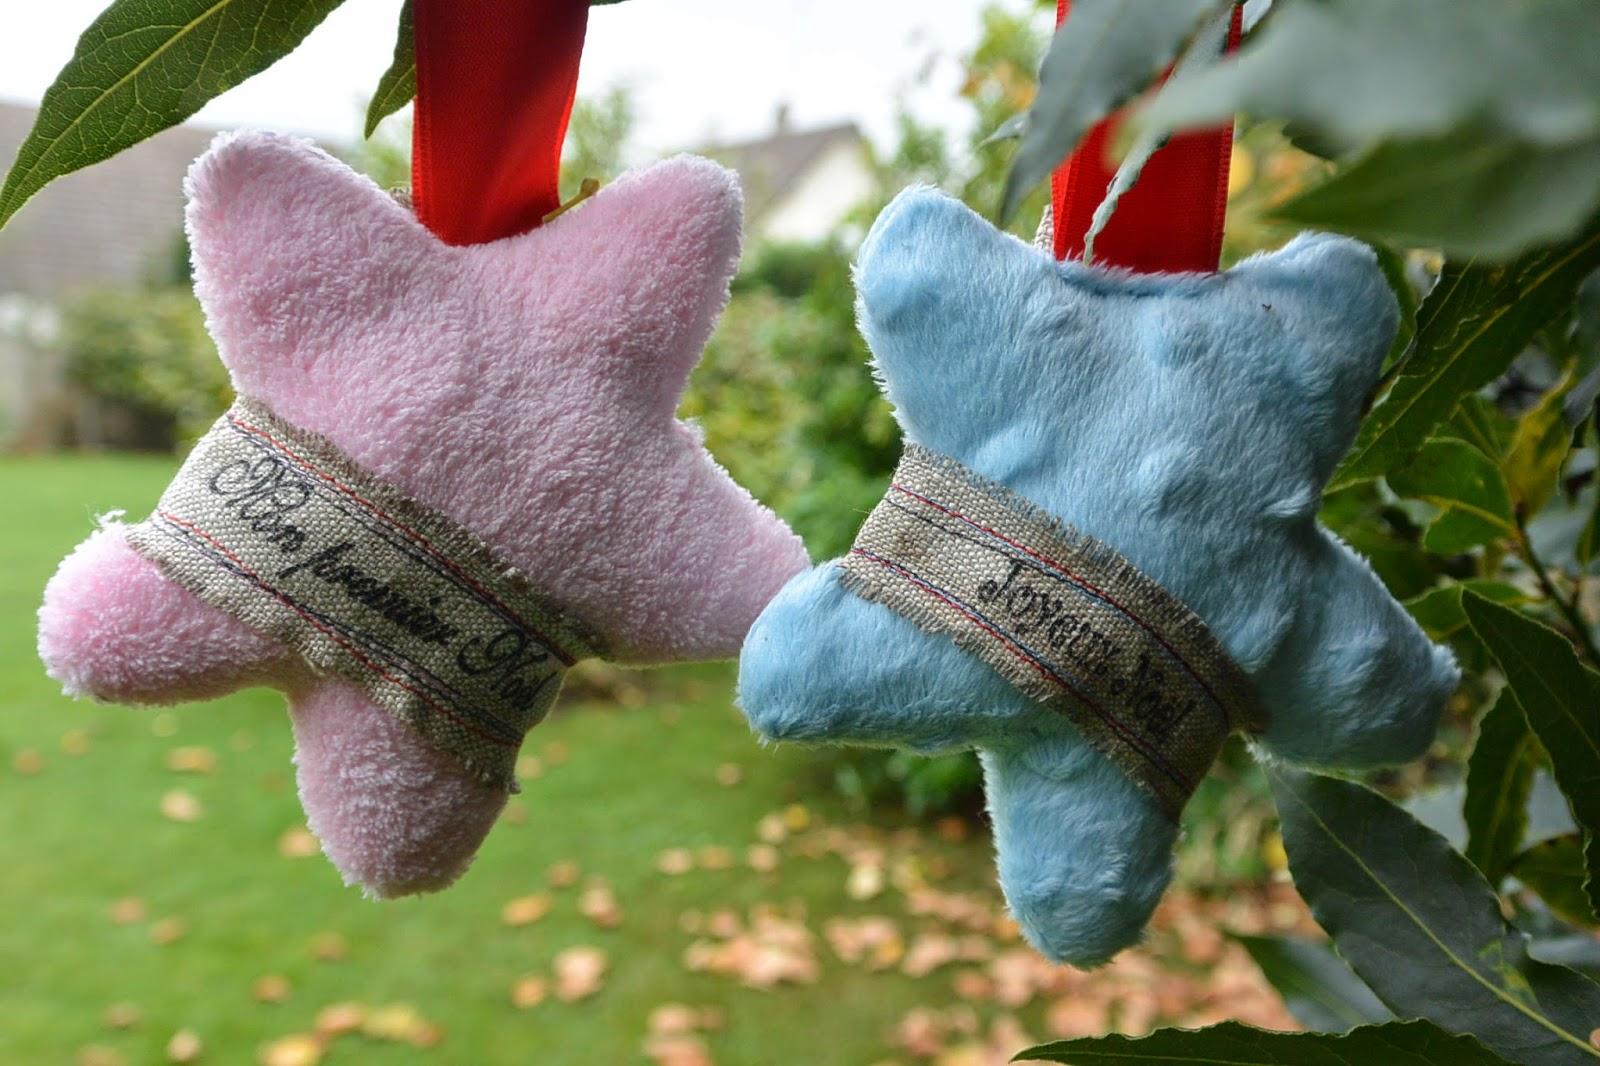 boule de Noël mon premier noël forme étoile en tissu tout doux. rose ou bleu